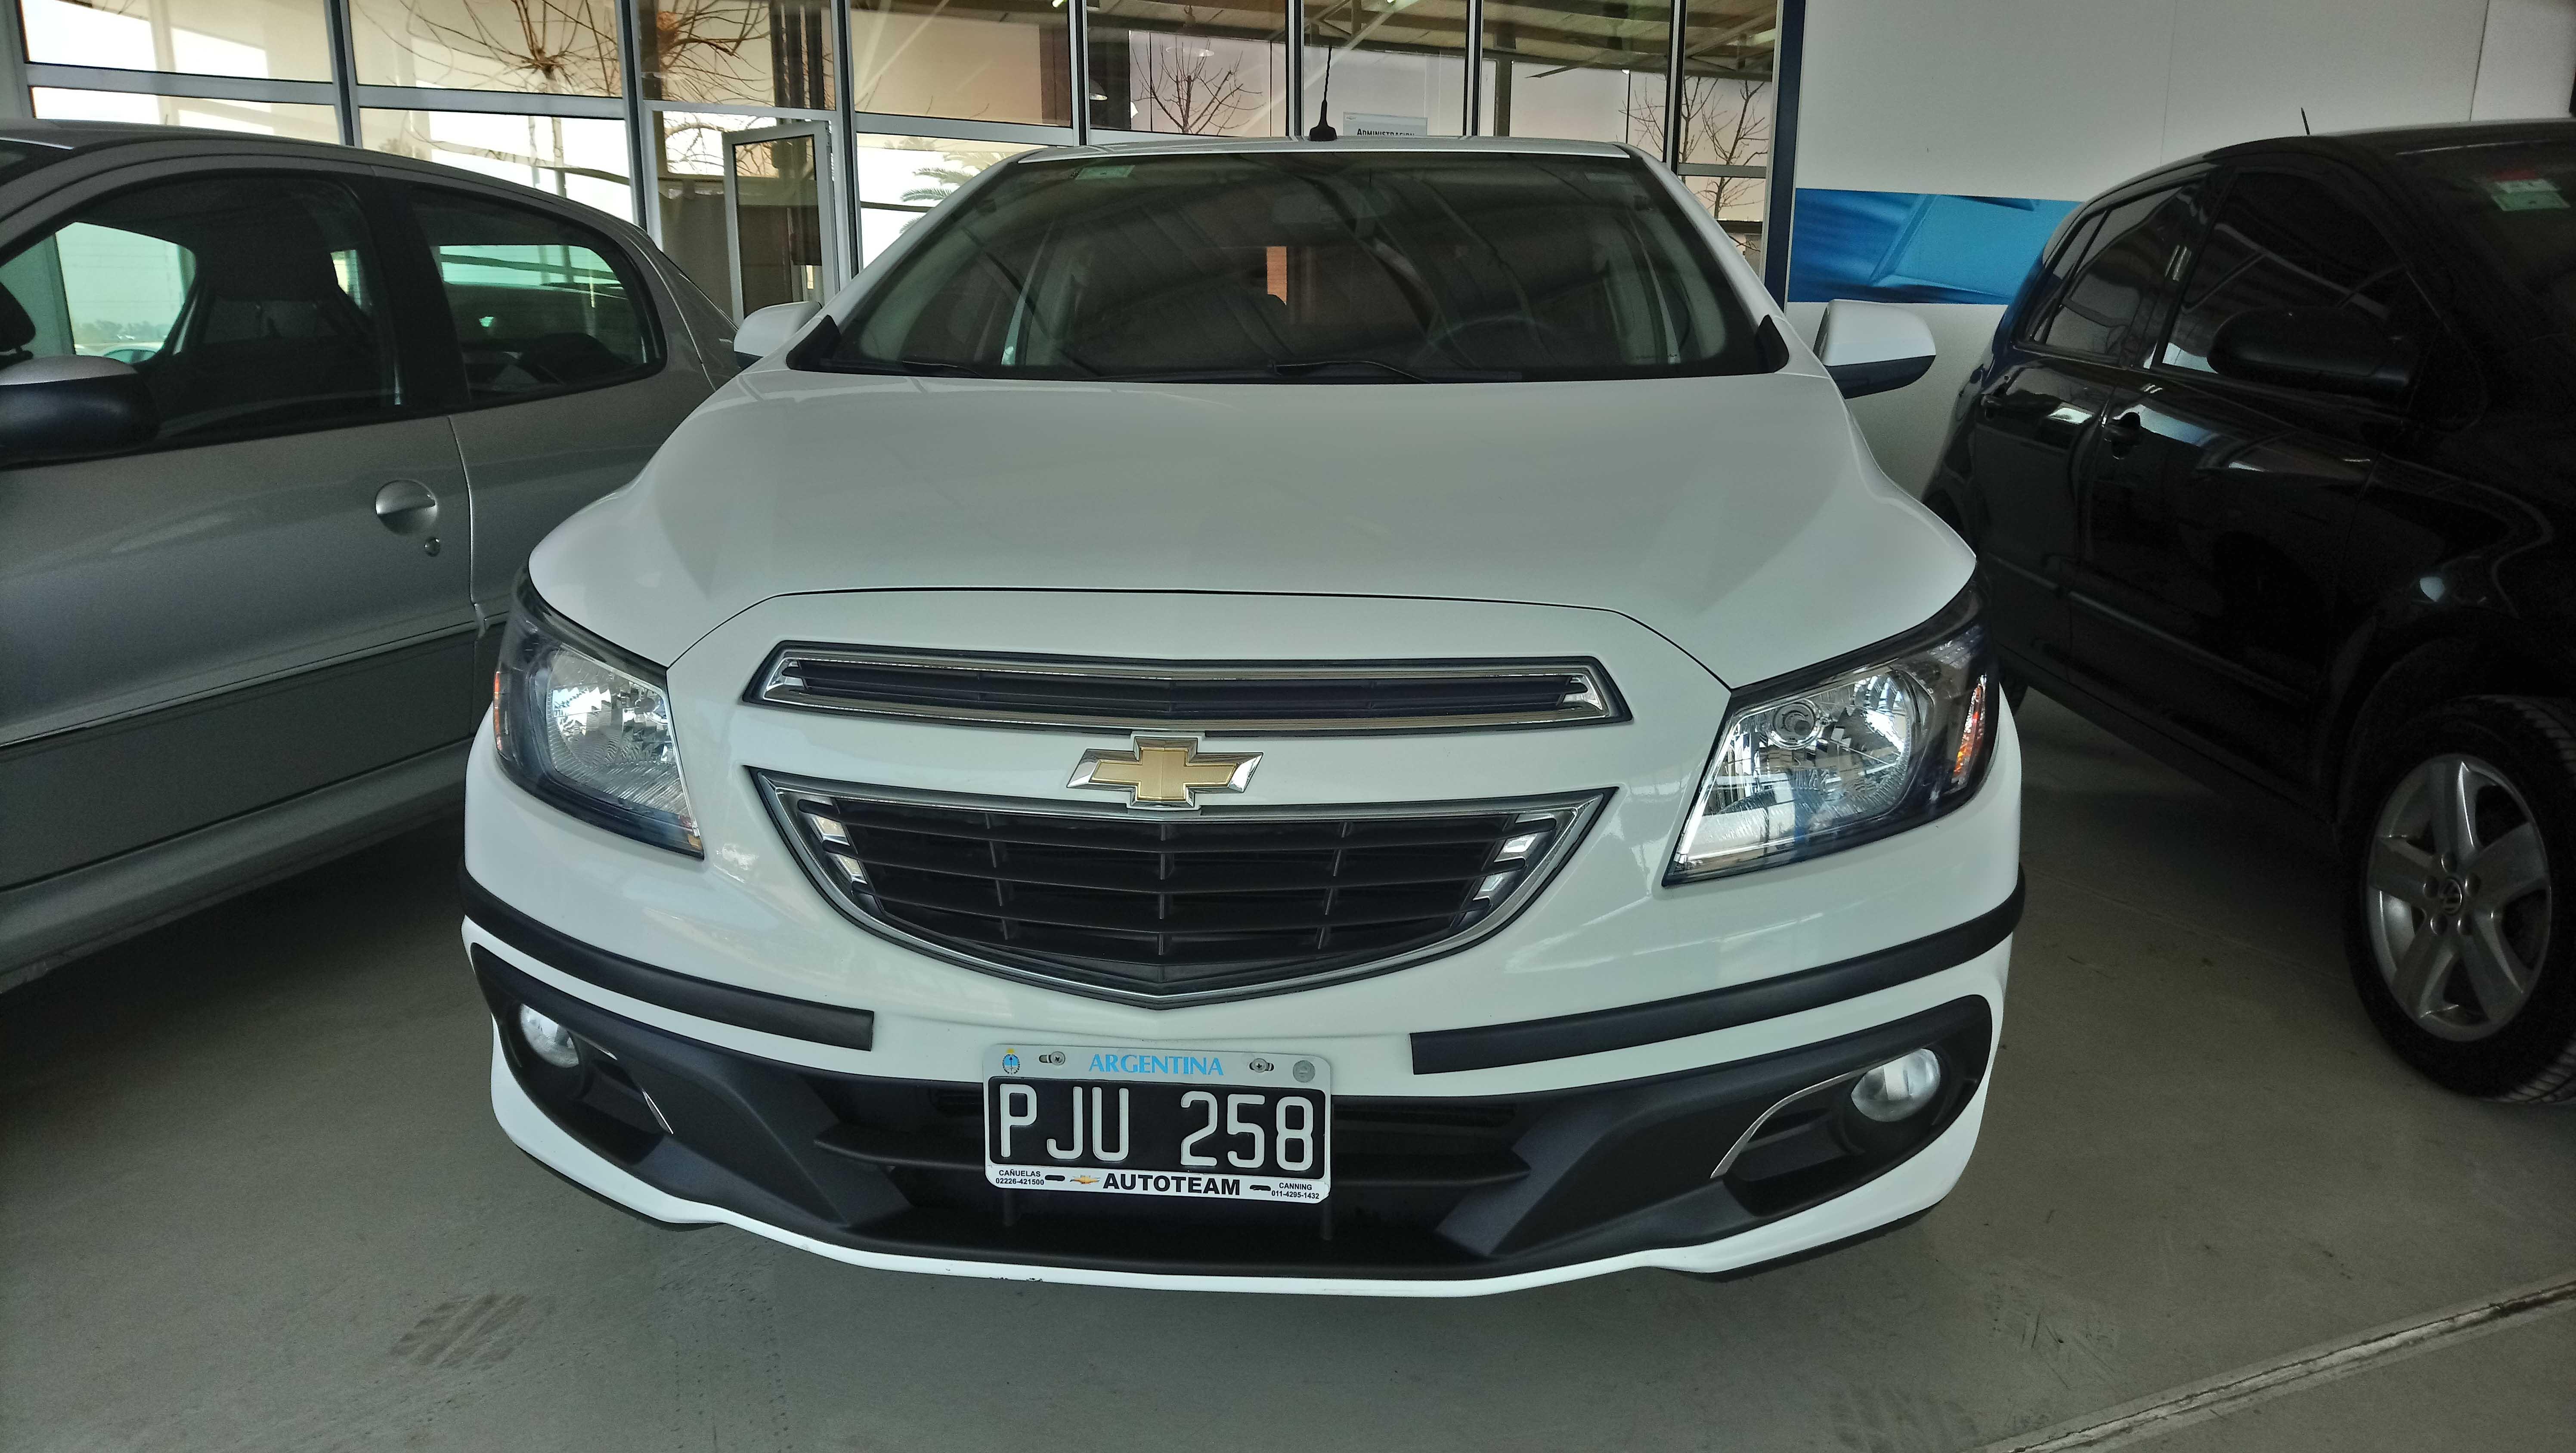 2015 Chevrolet Prisma LTZ 1.4L